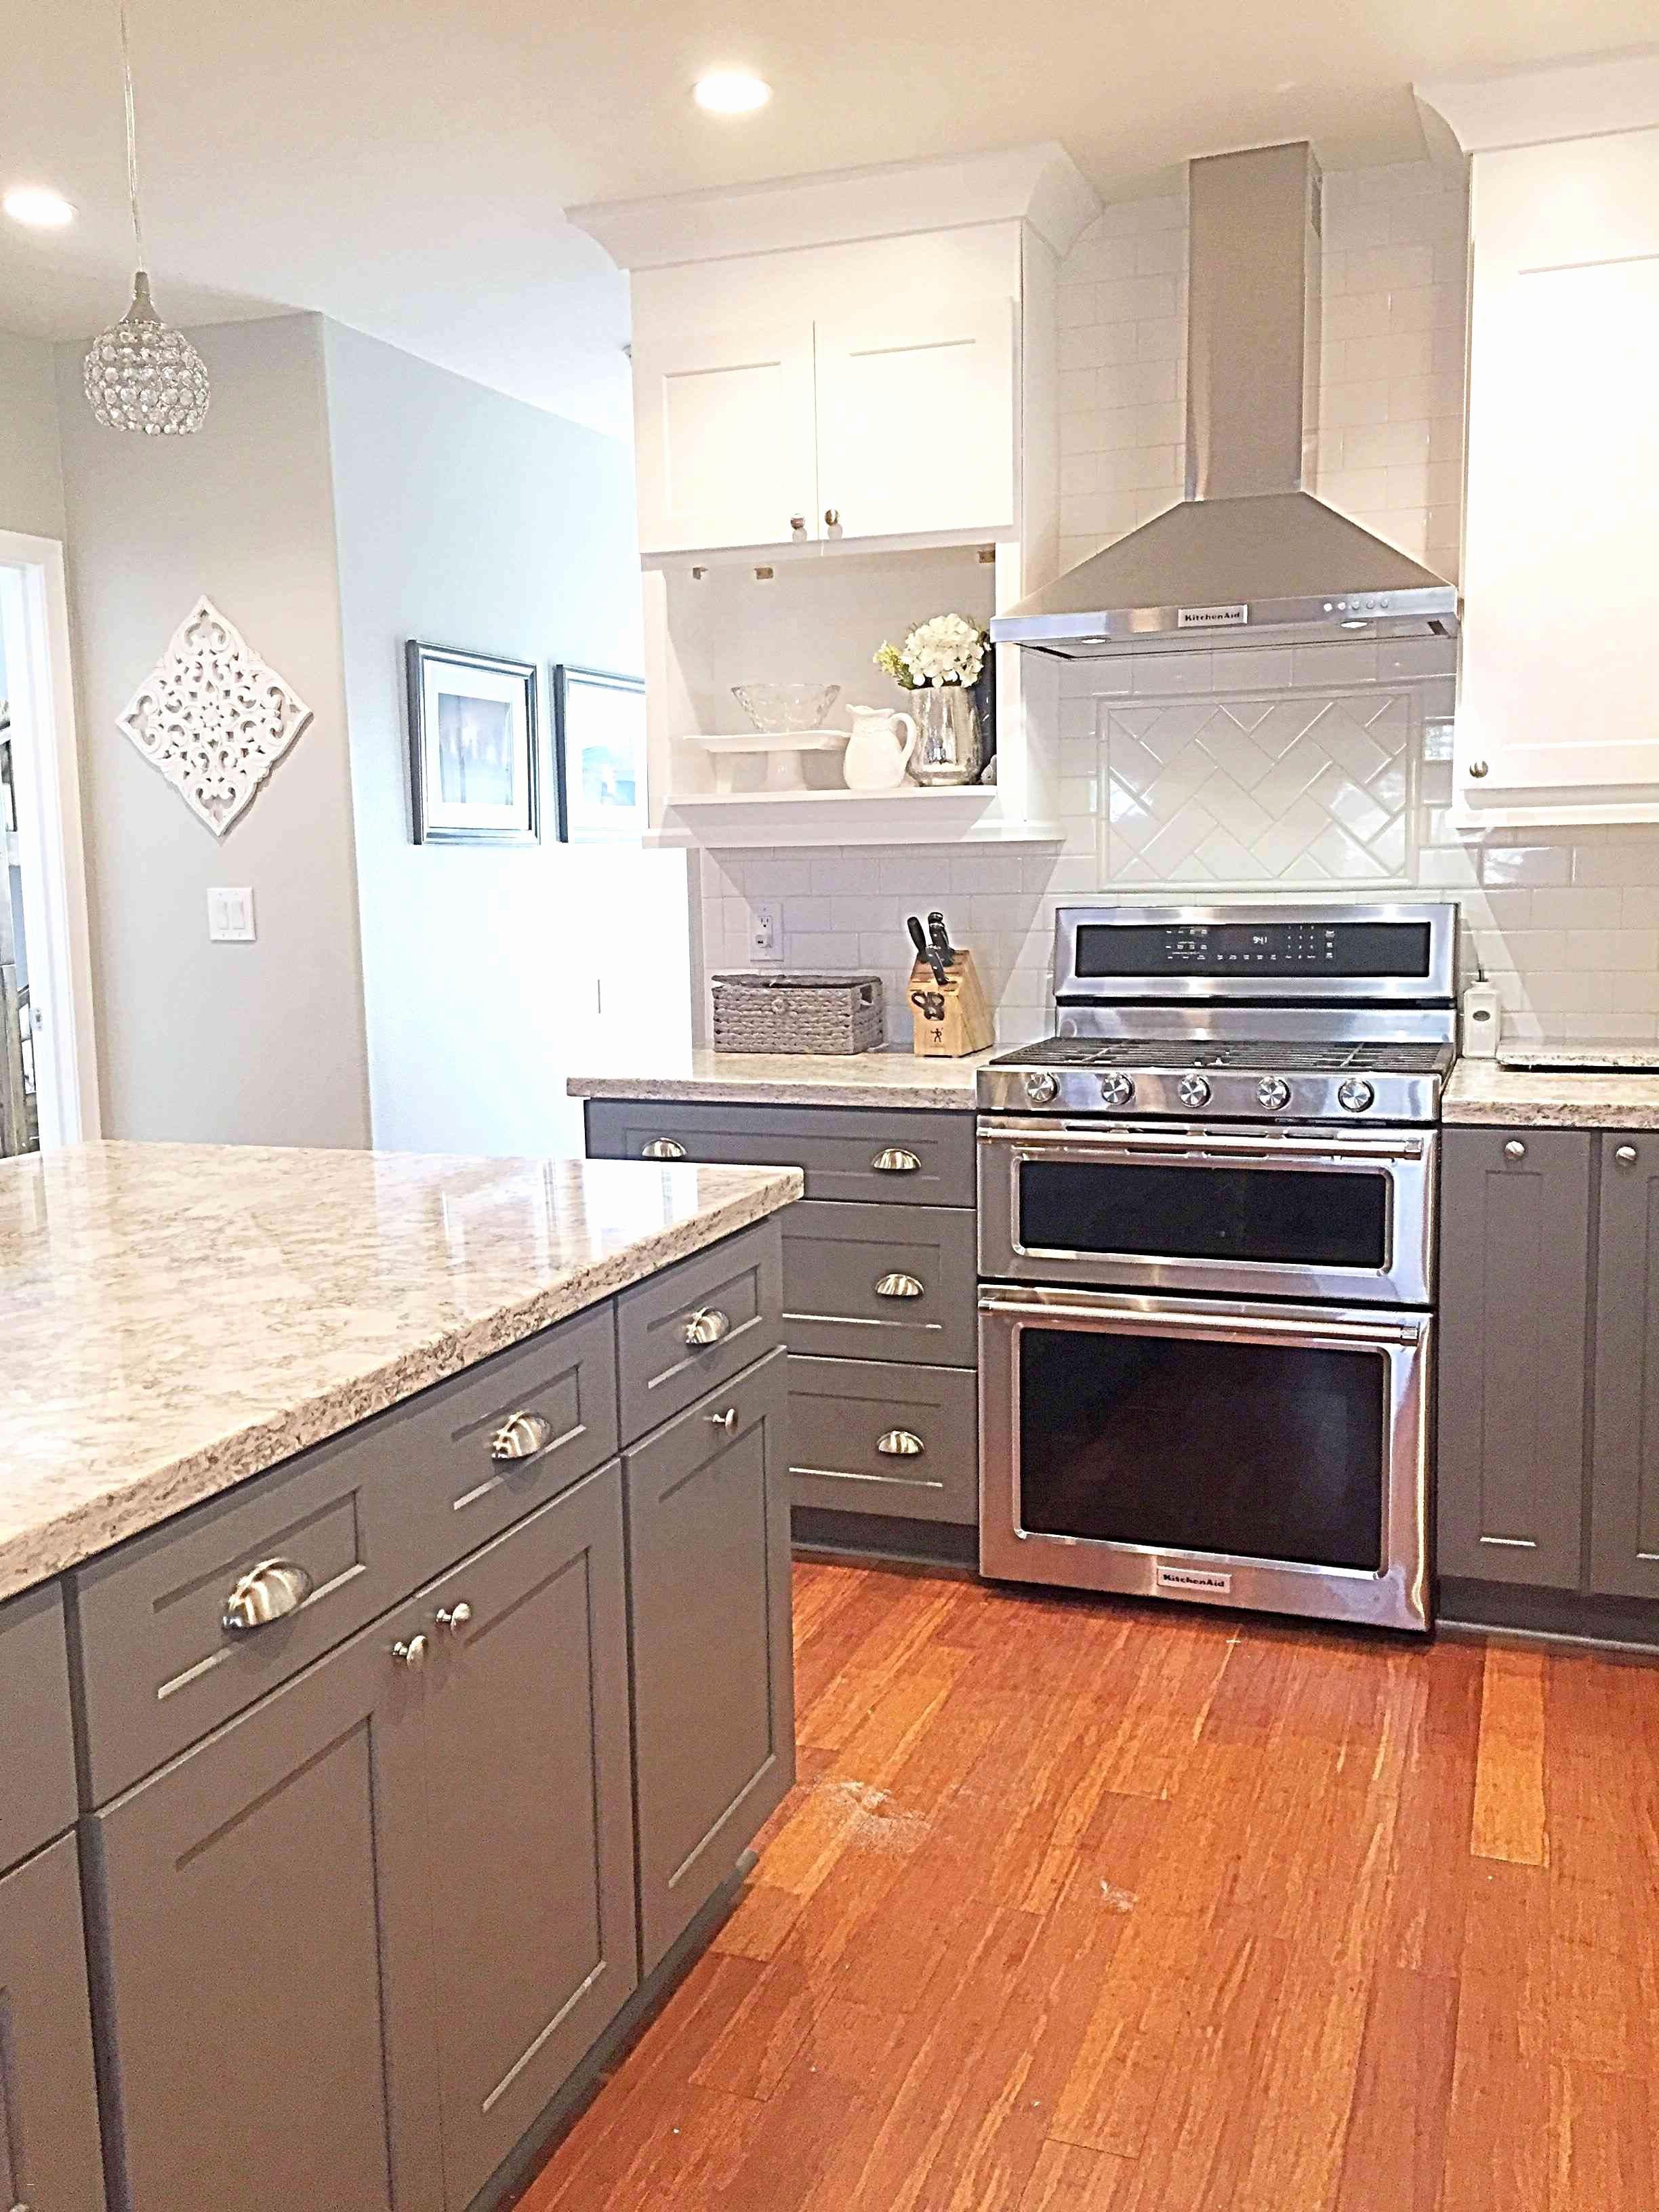 13 Amazing Dark Hardwood Floors with Maple Cabinets ... on Dark Maple Cabinets  id=35691